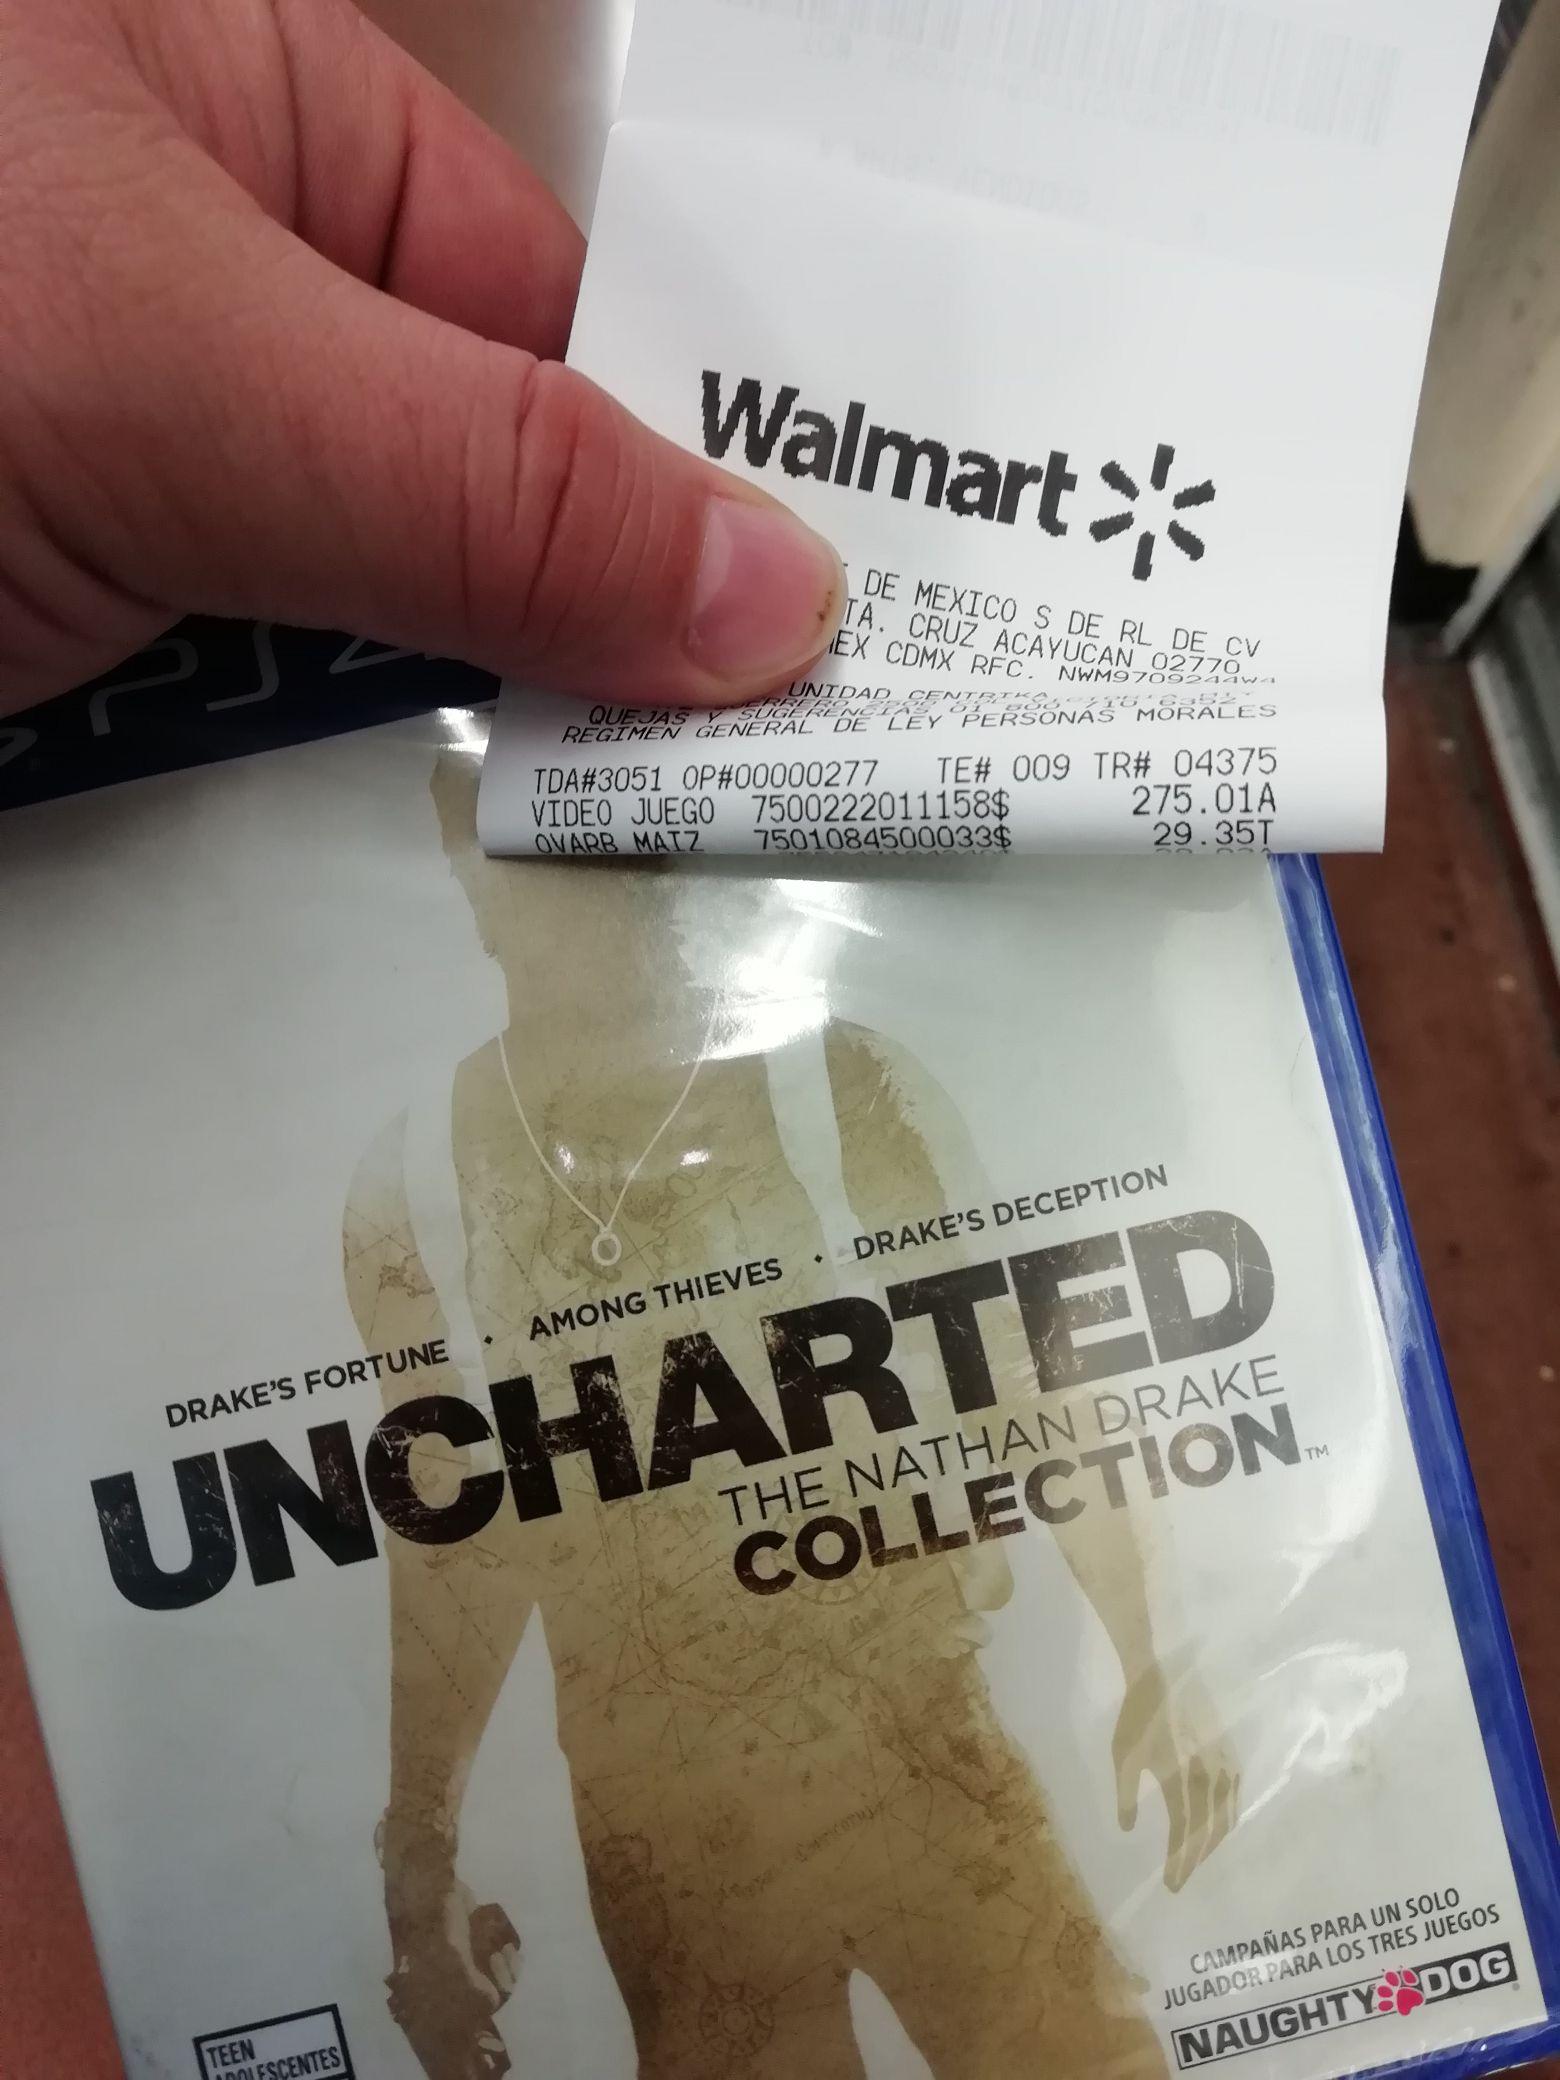 Walmart: Uncharted Collection